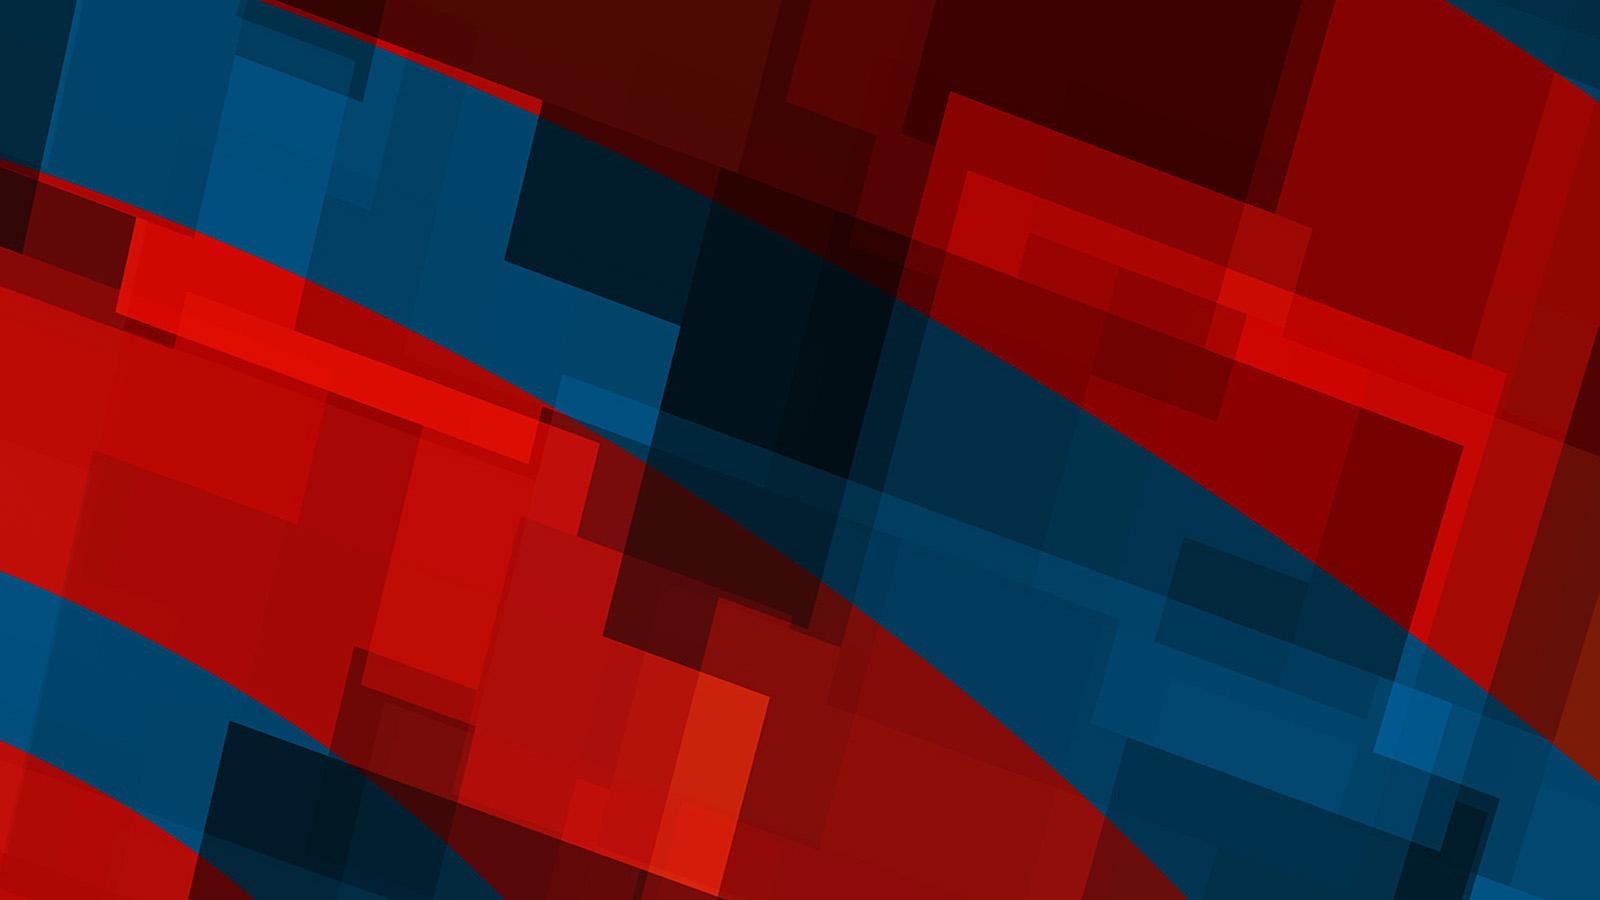 Wallpaper For Desktop Laptop Vo59 Art Red Blue Block